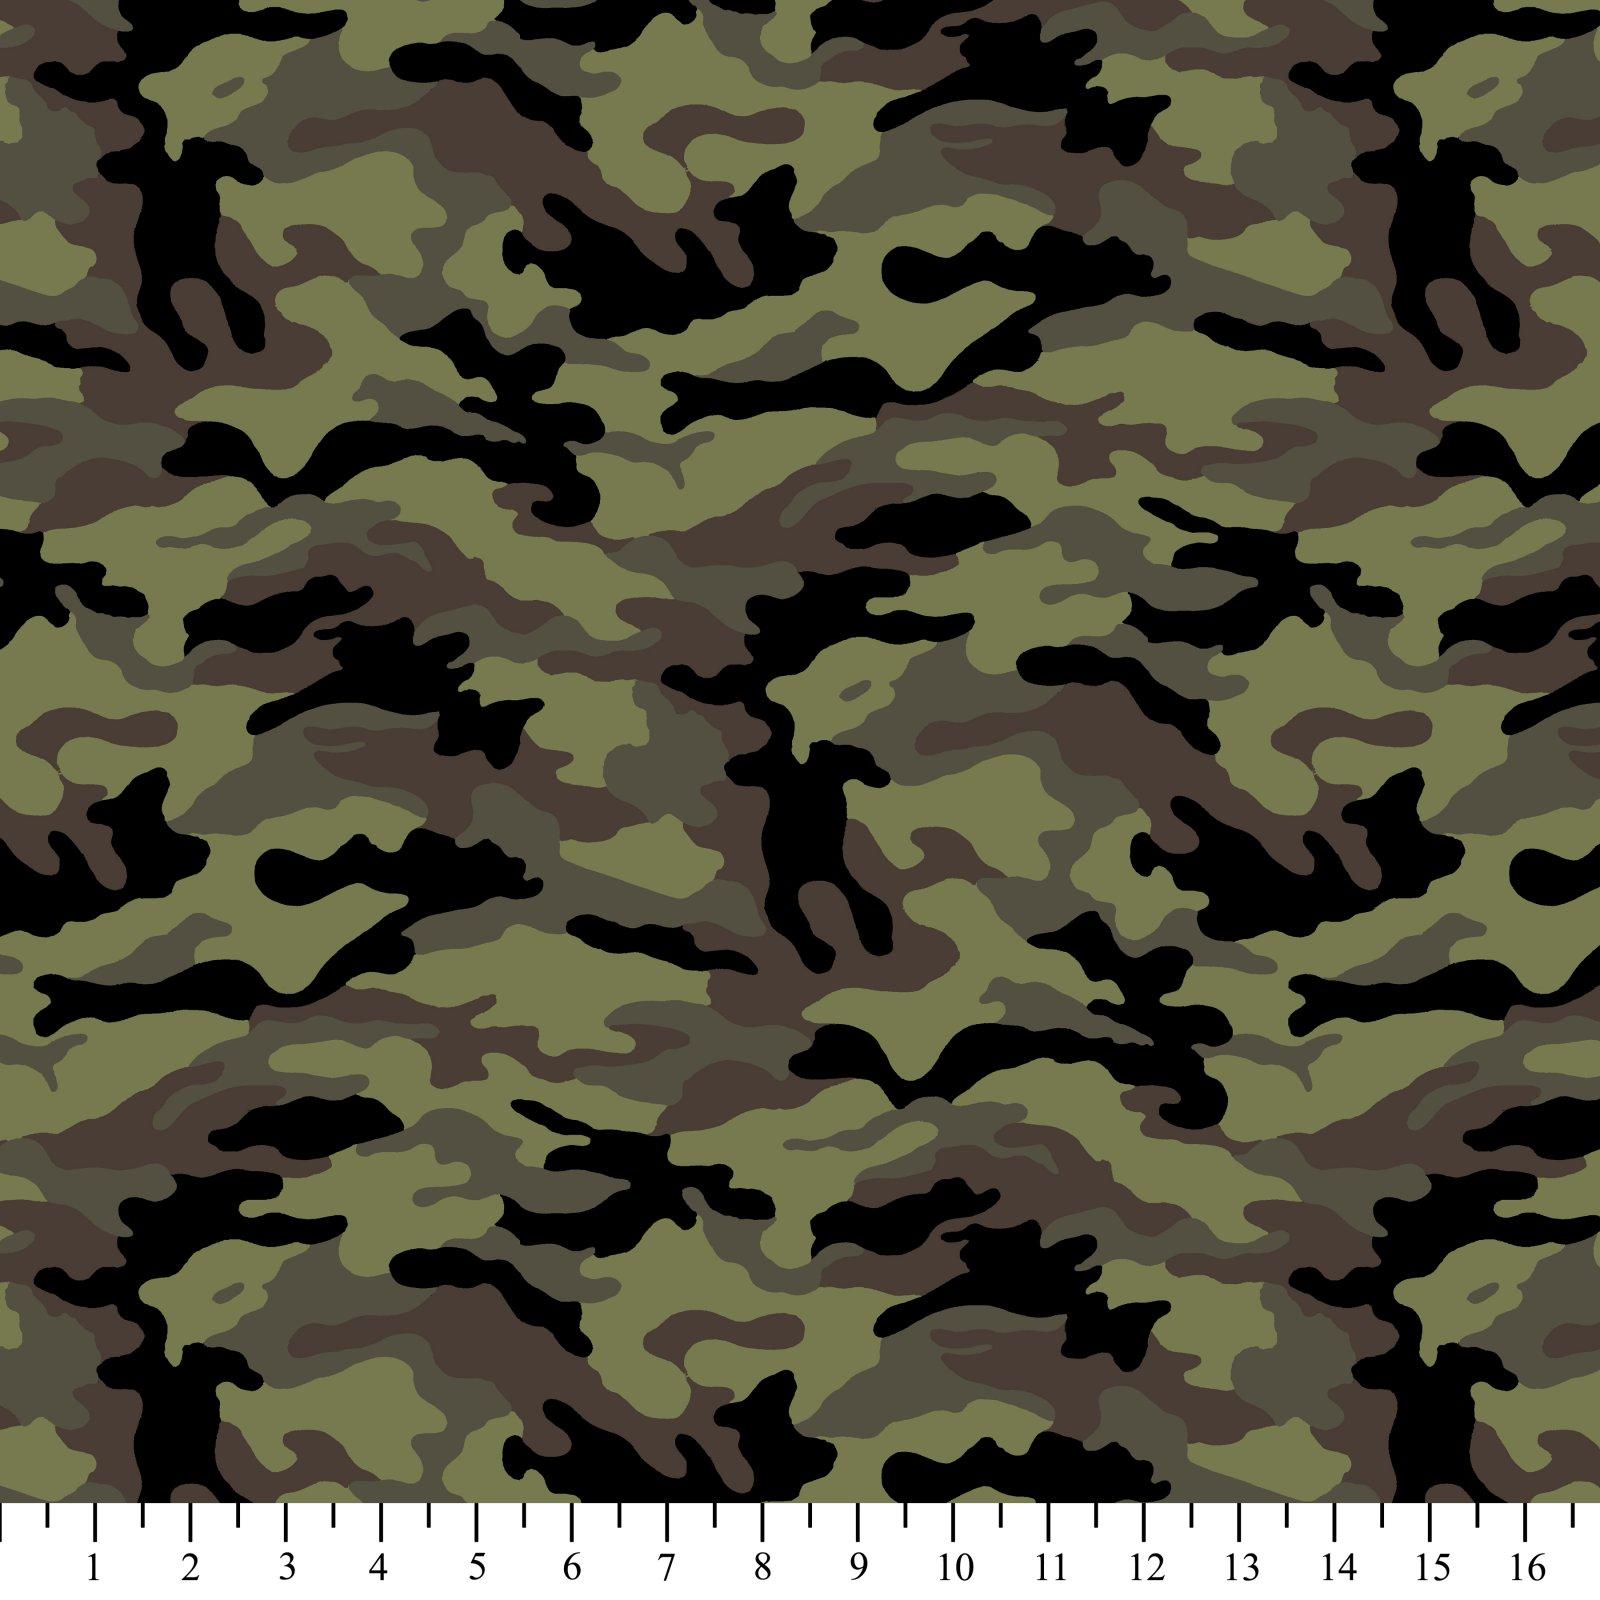 Kickin Camo -Army 03 Camouflage David Textiles 44/45 100% Cotton - copy